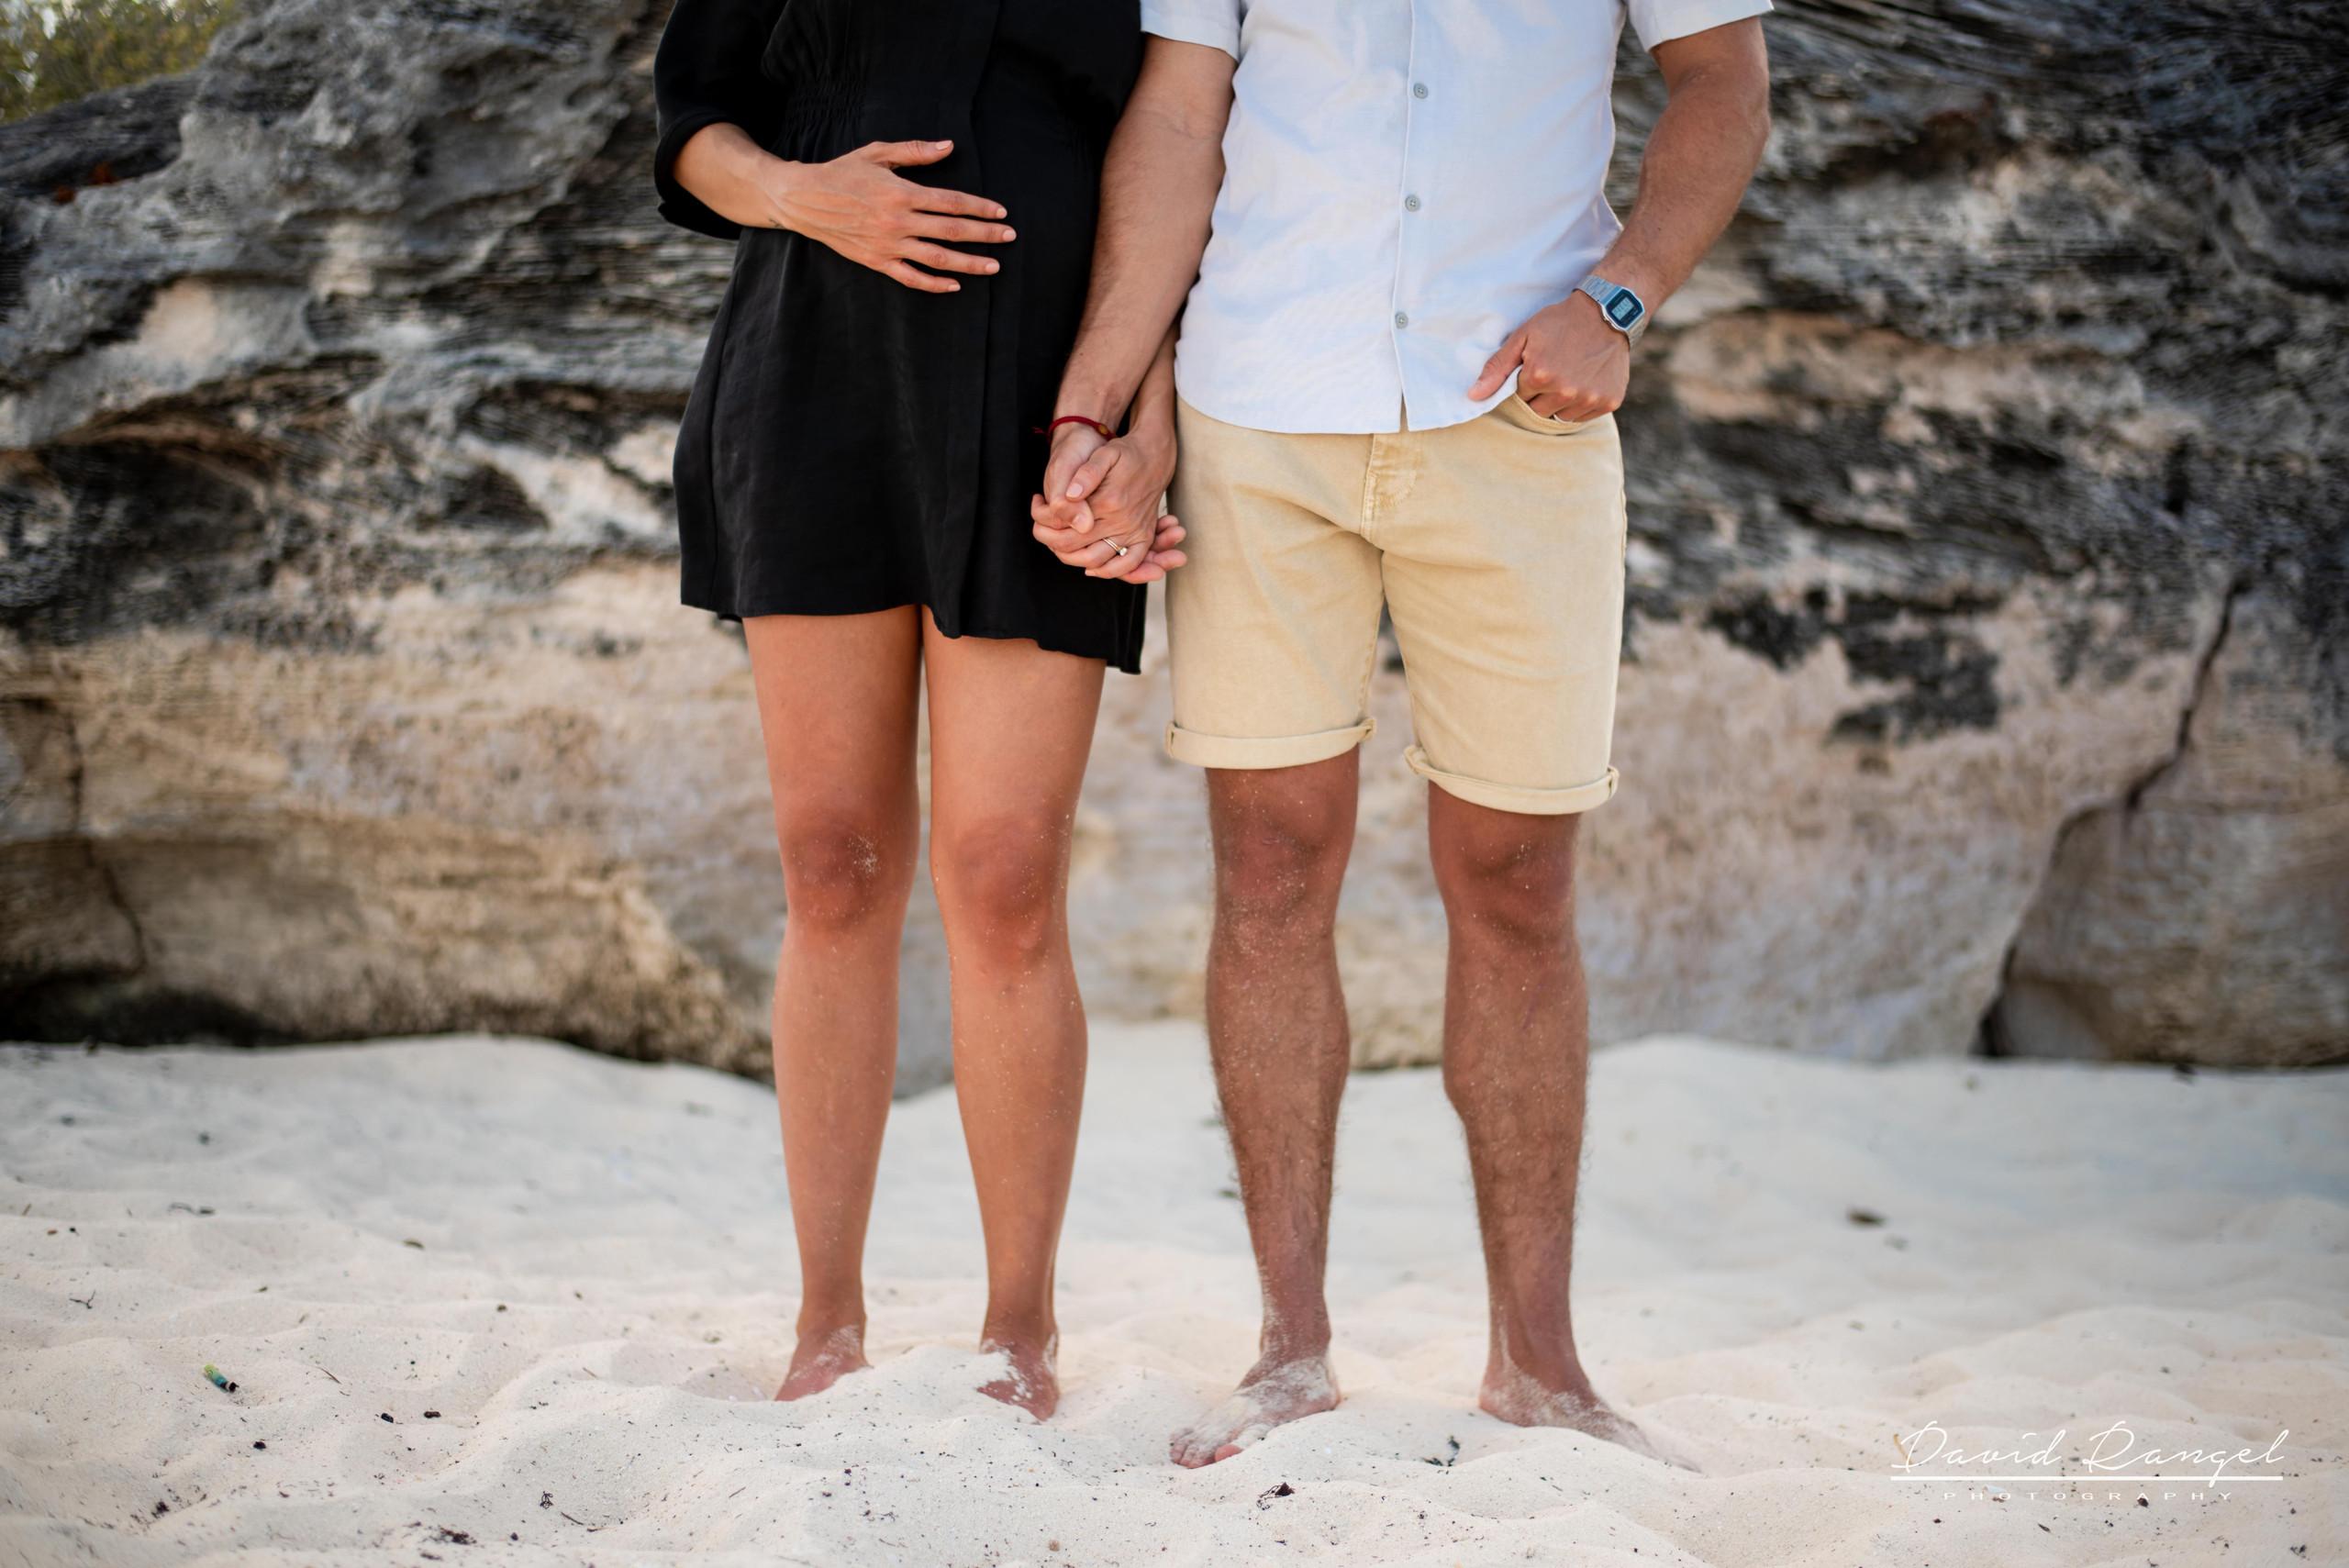 beach+session+riviera+maya+pregnancy+rocks+couple+future+mother+mom+love+legs+belly